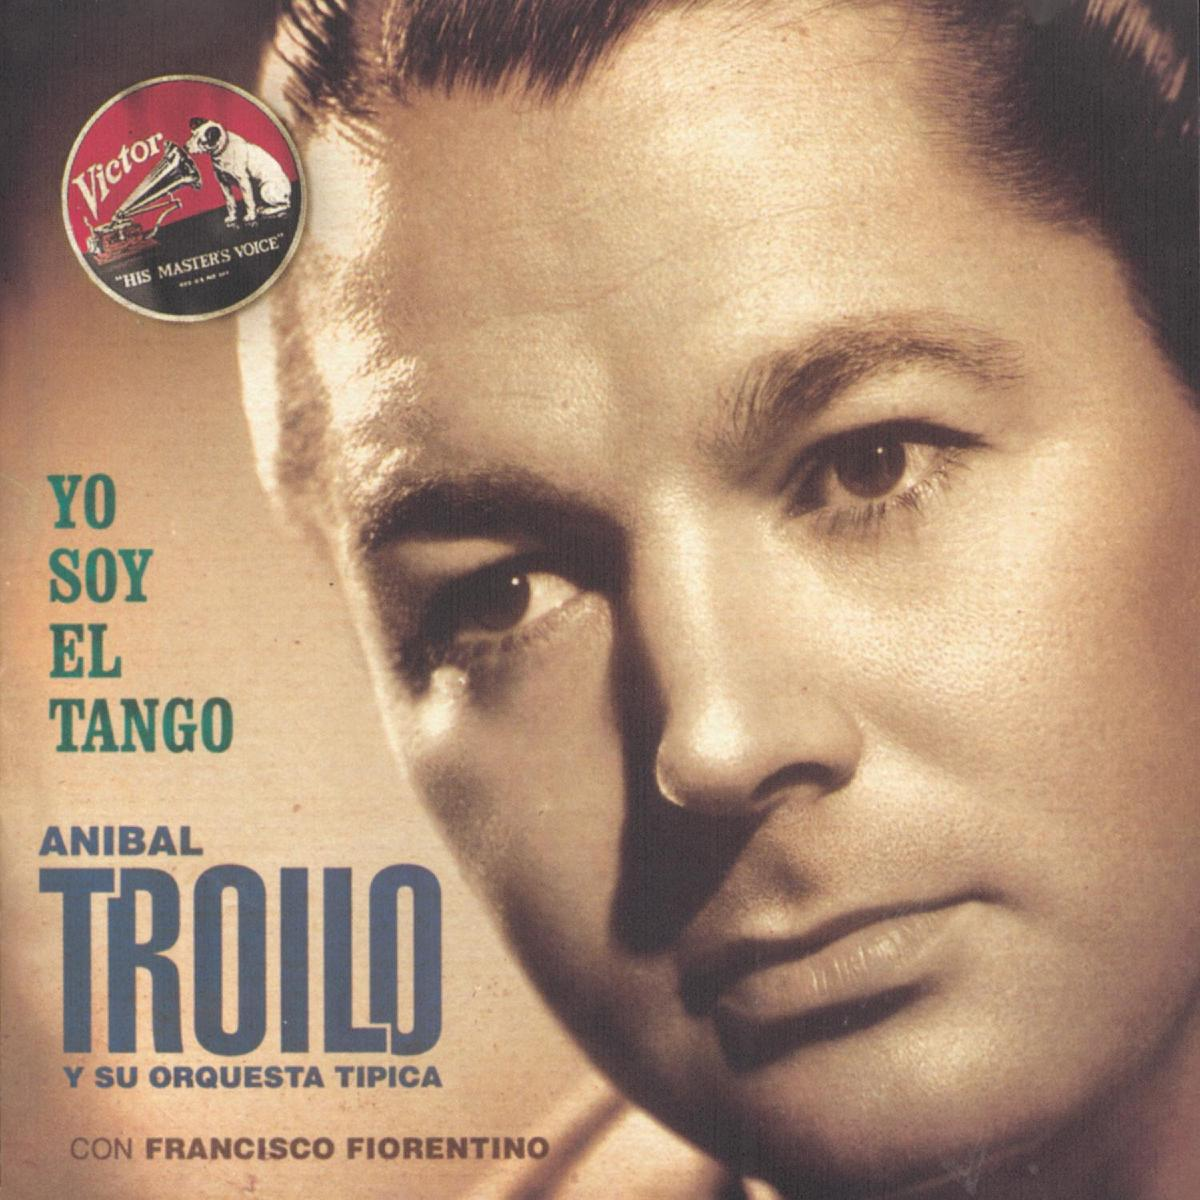 Libro - Wikipedia, la enciclopedia libre Yo soy tango fashion